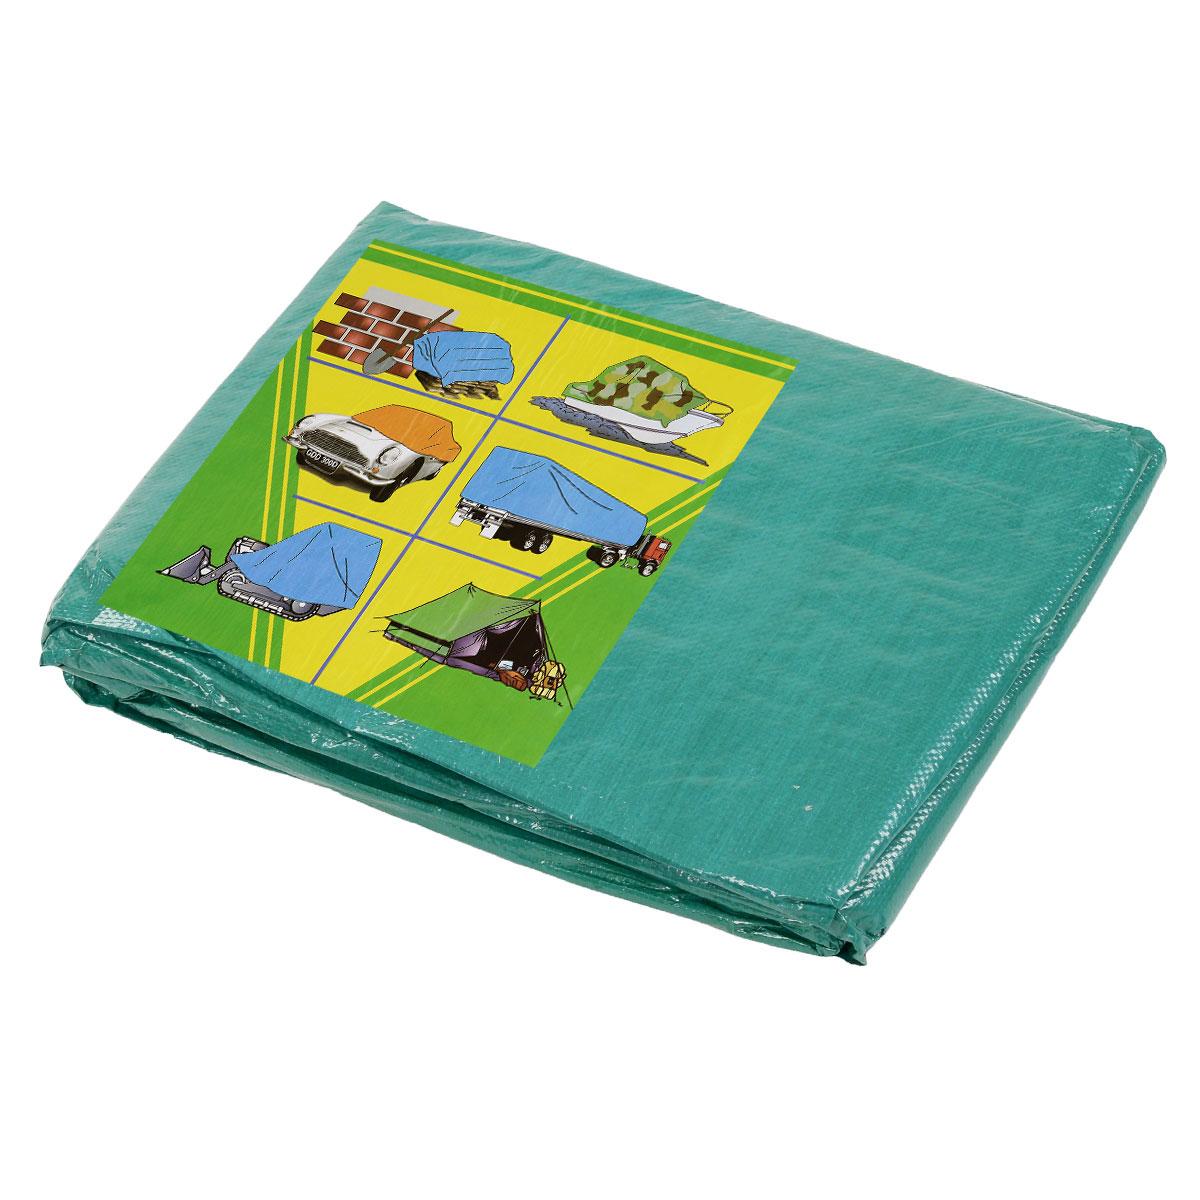 Тент терпаулинг Indiana, цвет: зеленый, 3 м х 5 м чехол для декоративной подушки flutter p502 8351 2 43х43 см